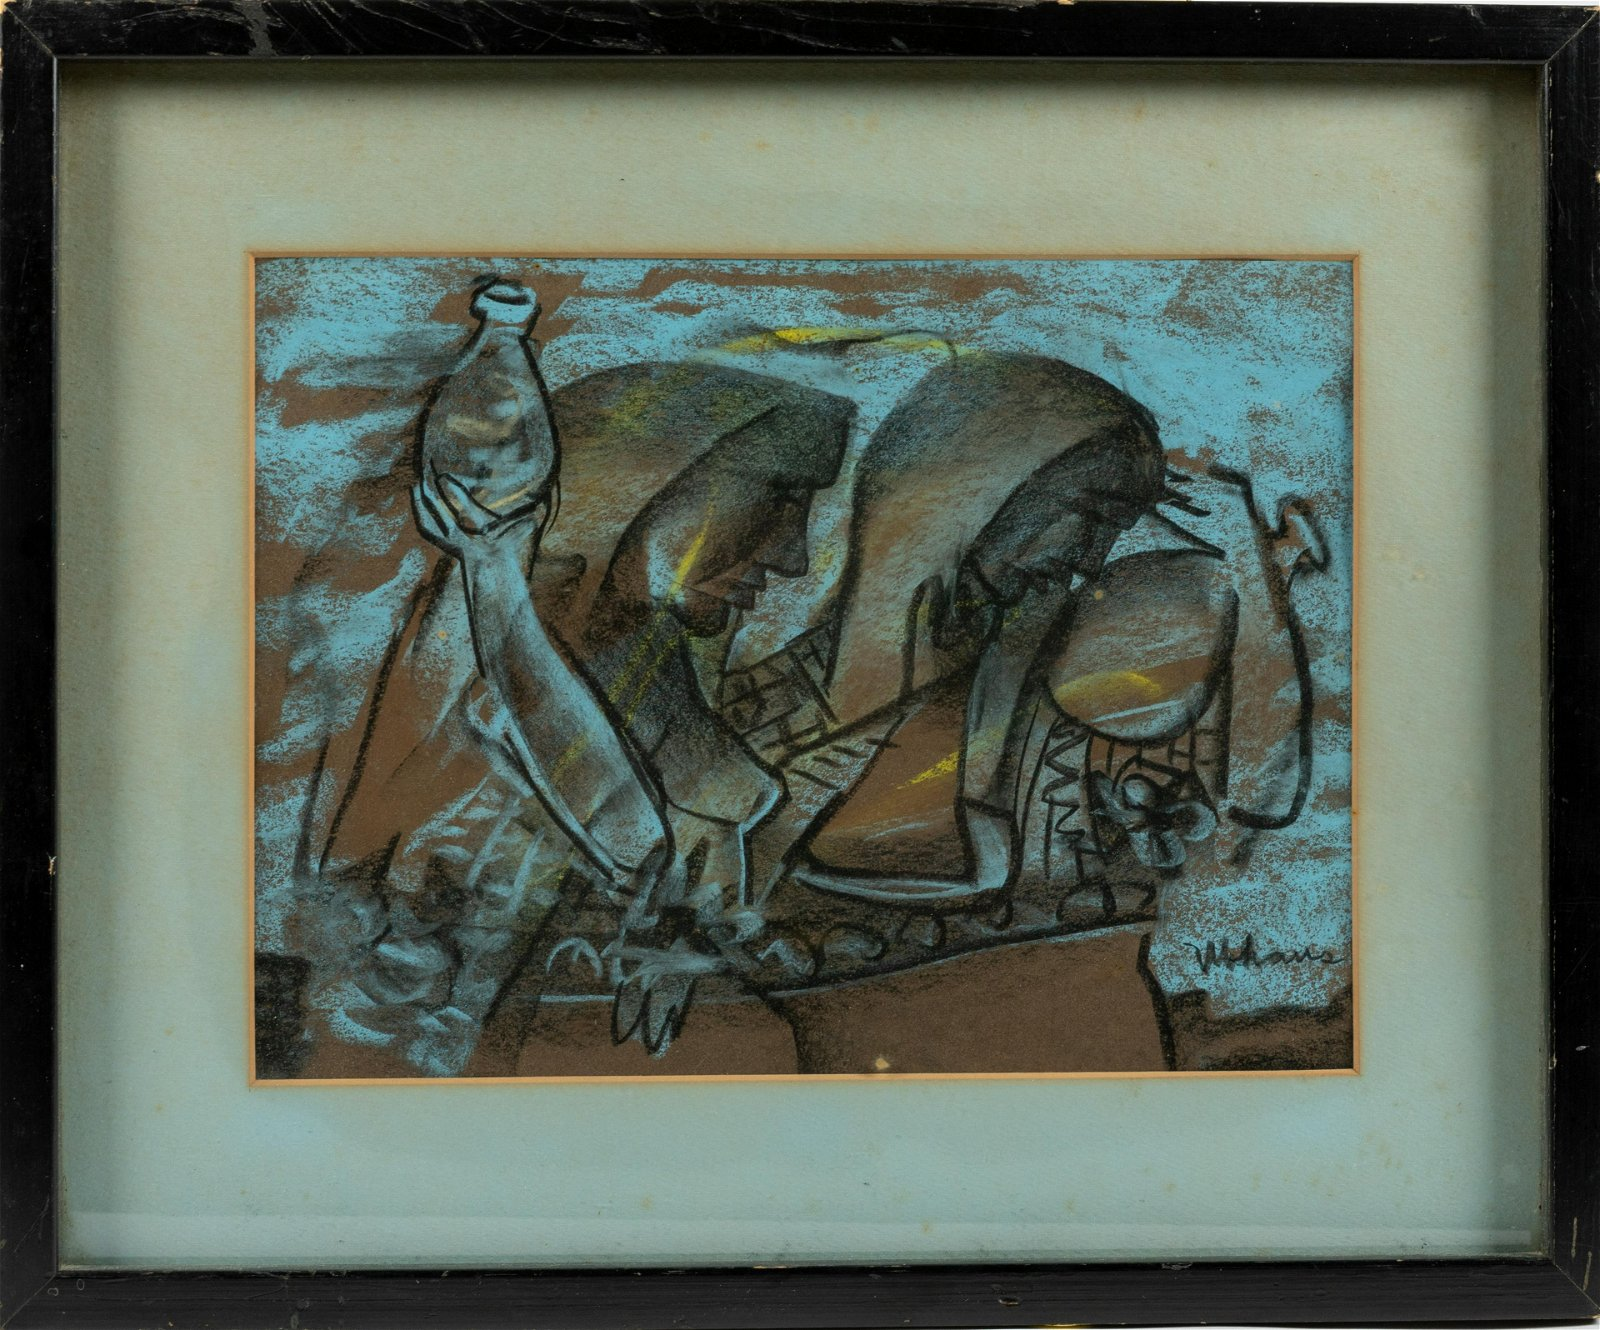 Robert Ubhaus - Cubist Pastel on Paper